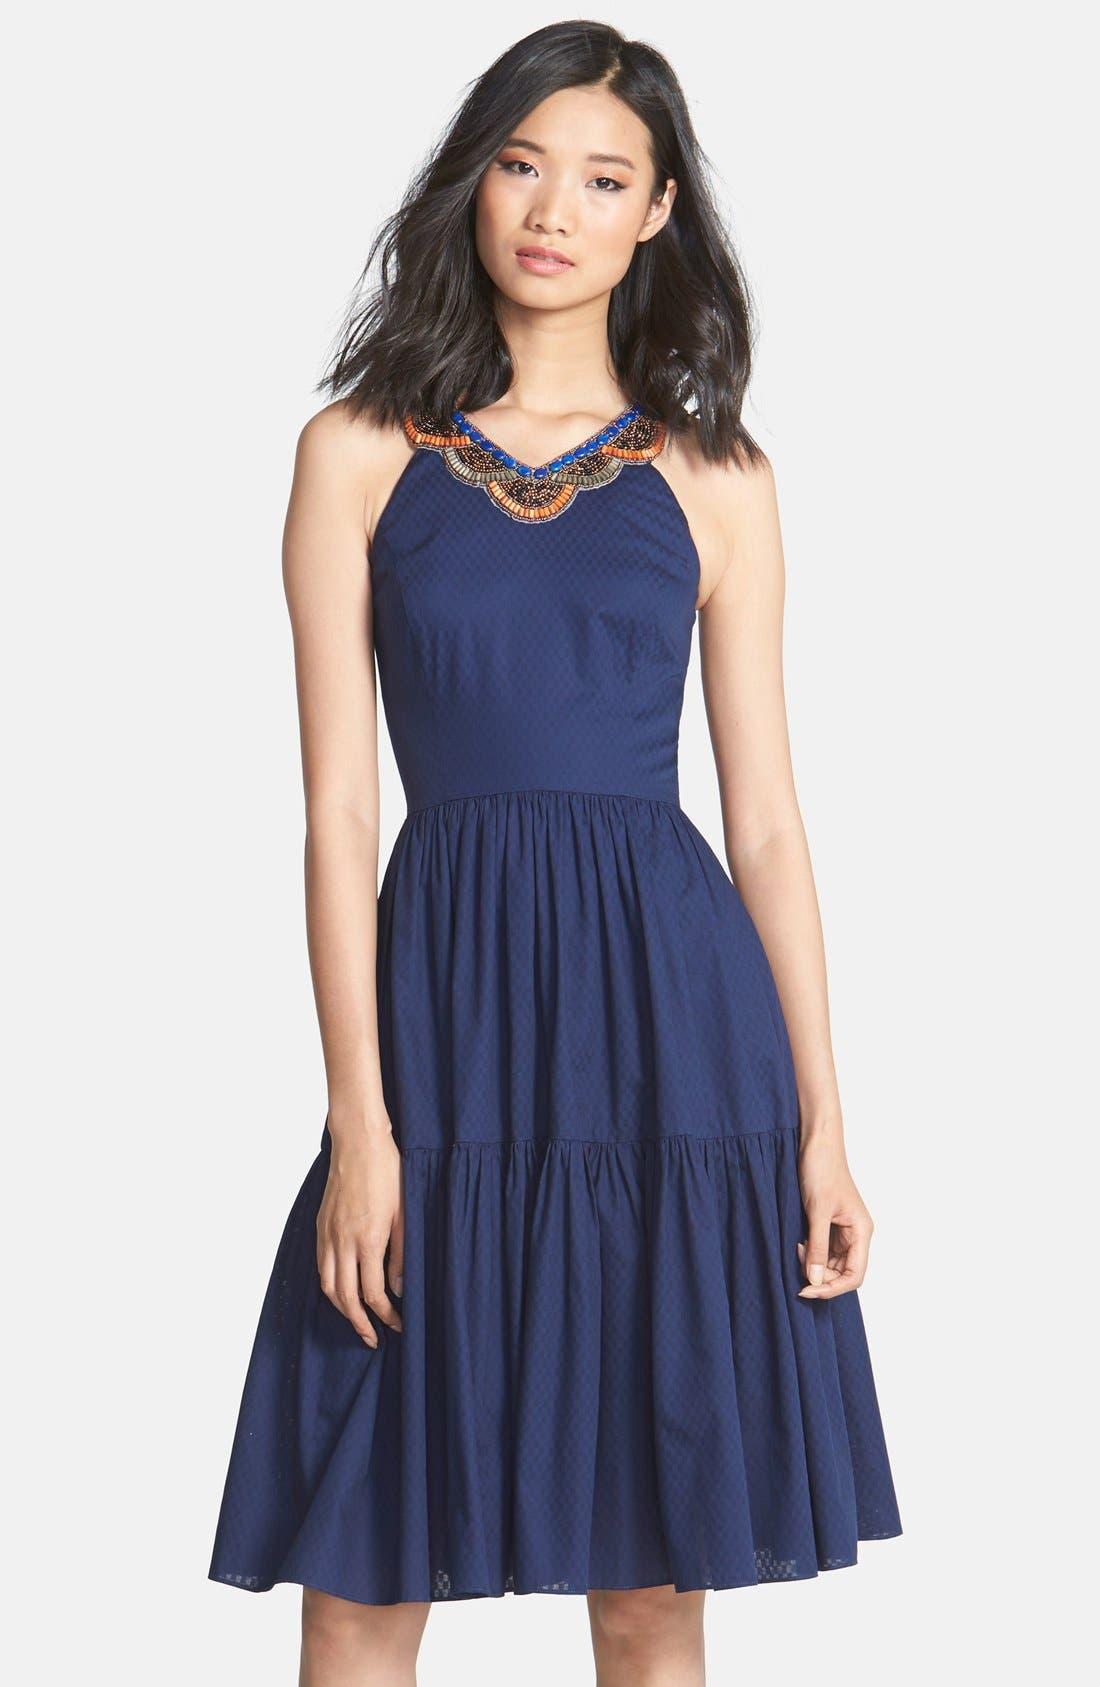 Alternate Image 1 Selected - Cynthia Steffe 'Jett' Embellished Tiered Jacquard Midi Dress